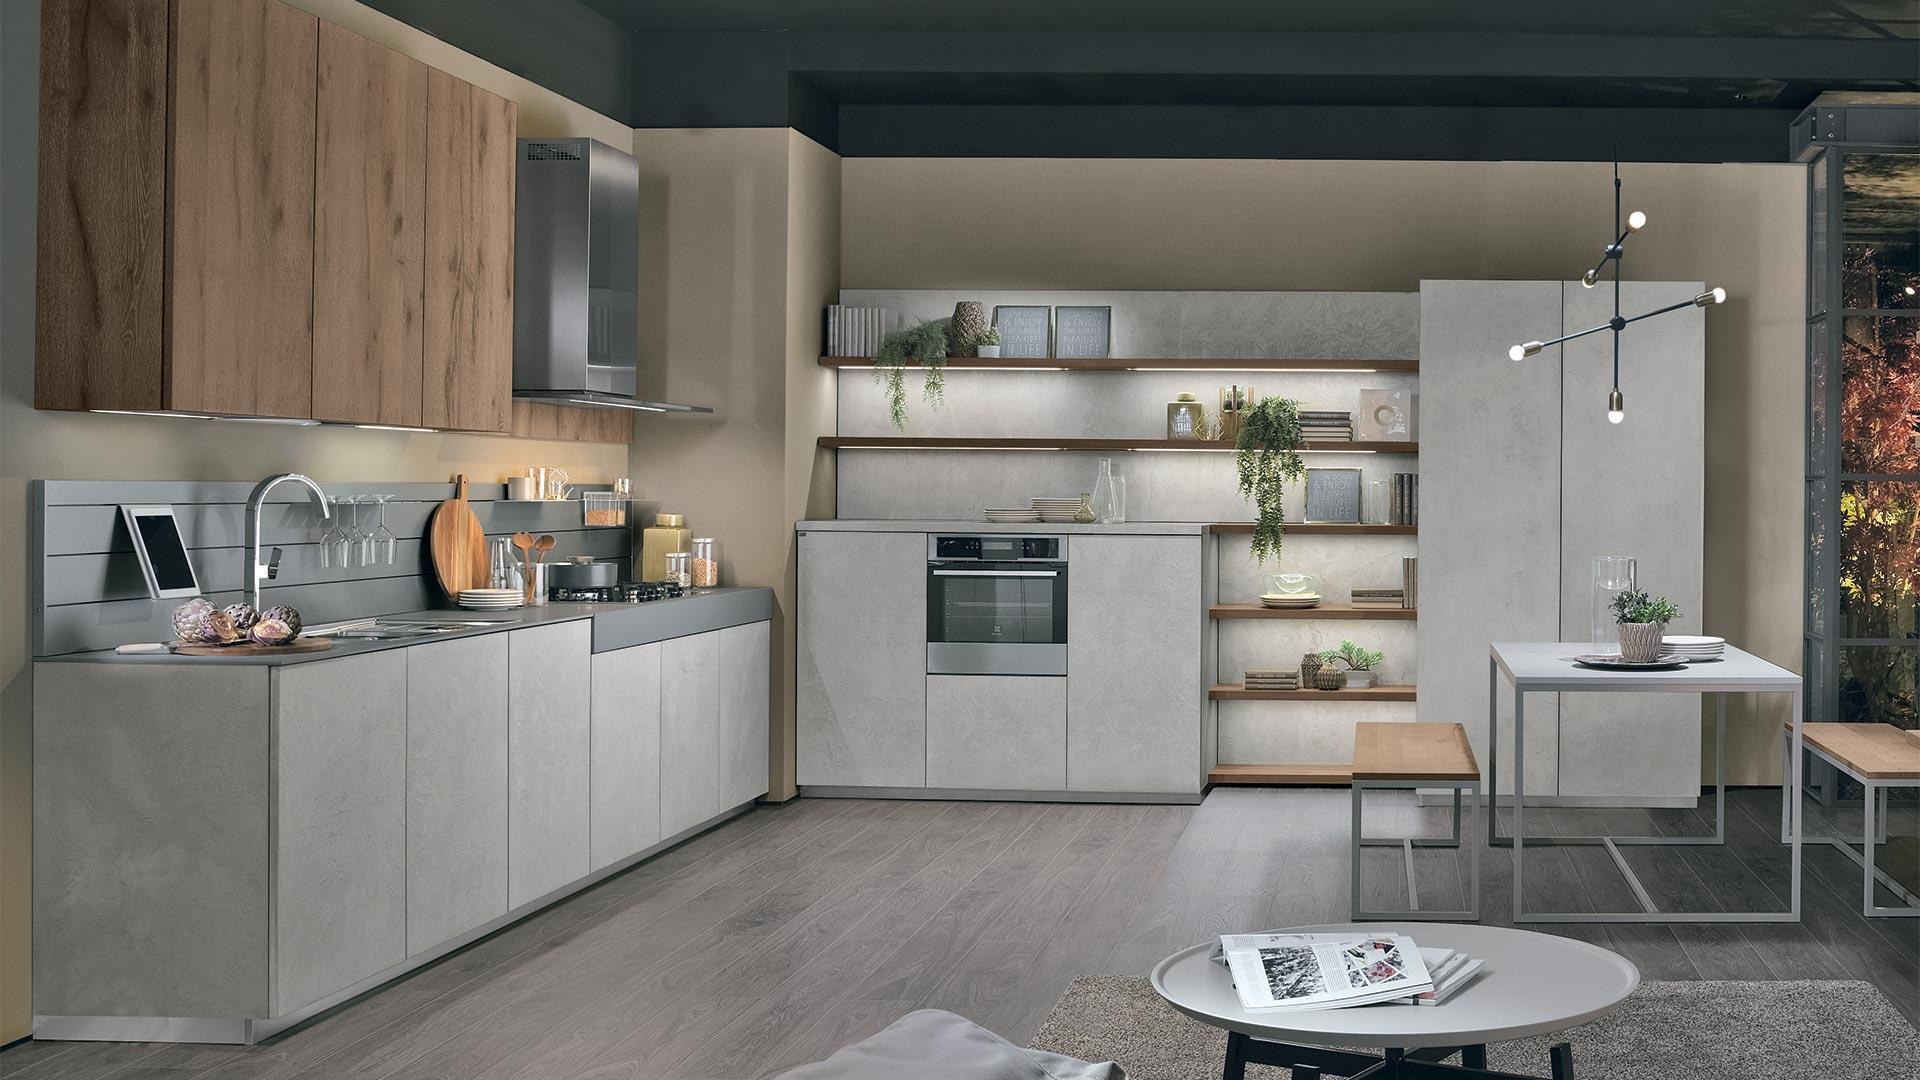 OLTRE - Lube Cucine - Cucina moderna